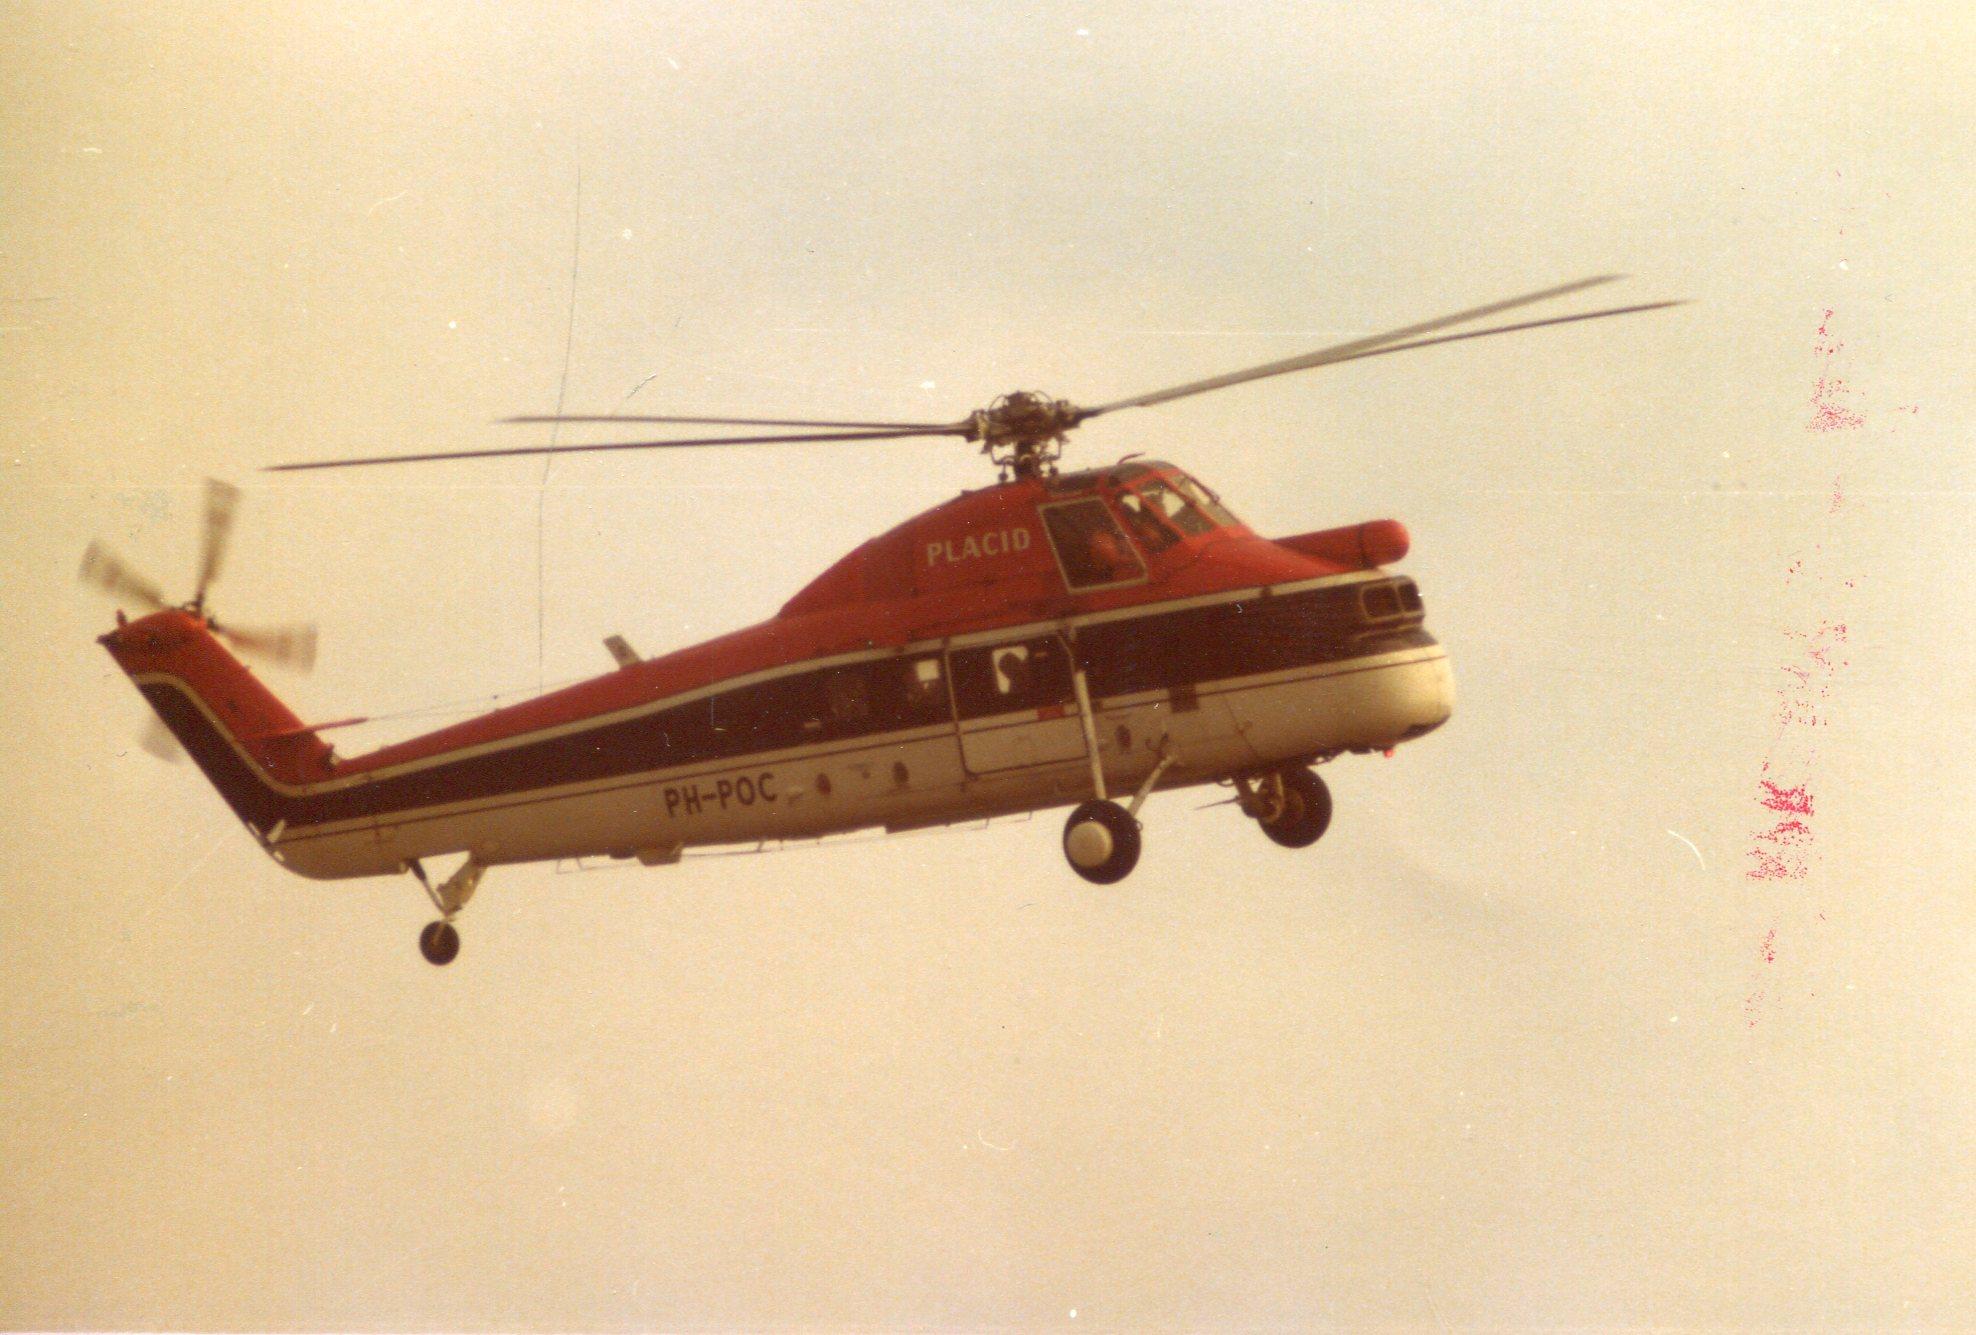 Naam: Den Helder , april 1977 (3).jpg Bekeken: 469 Grootte: 334,4 KB